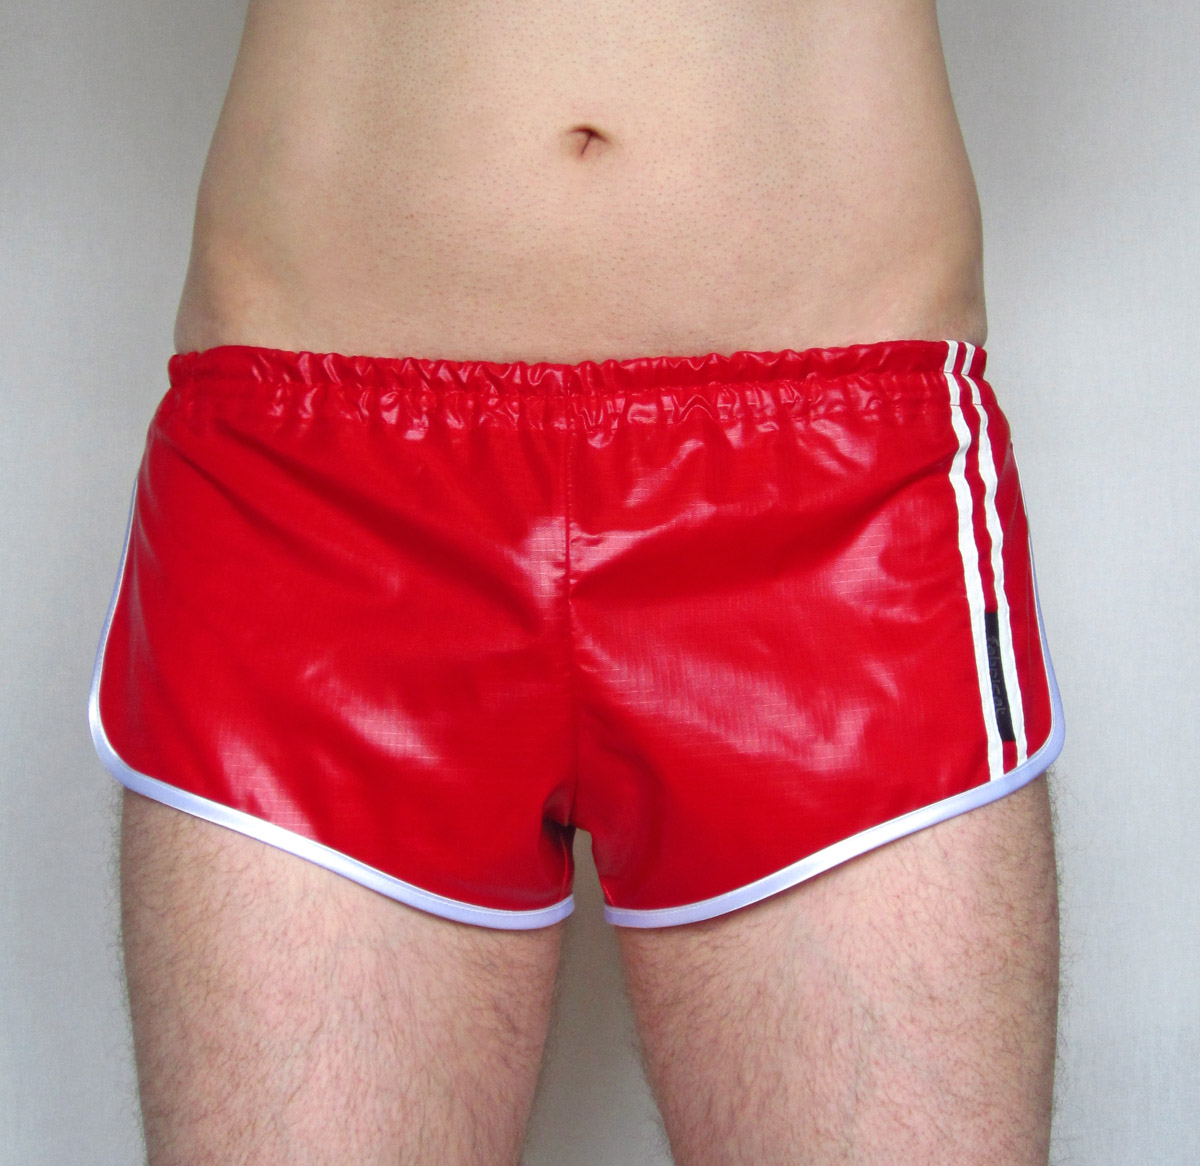 retro 80s shiny ripstop nylon sprinter shorts for men low. Black Bedroom Furniture Sets. Home Design Ideas